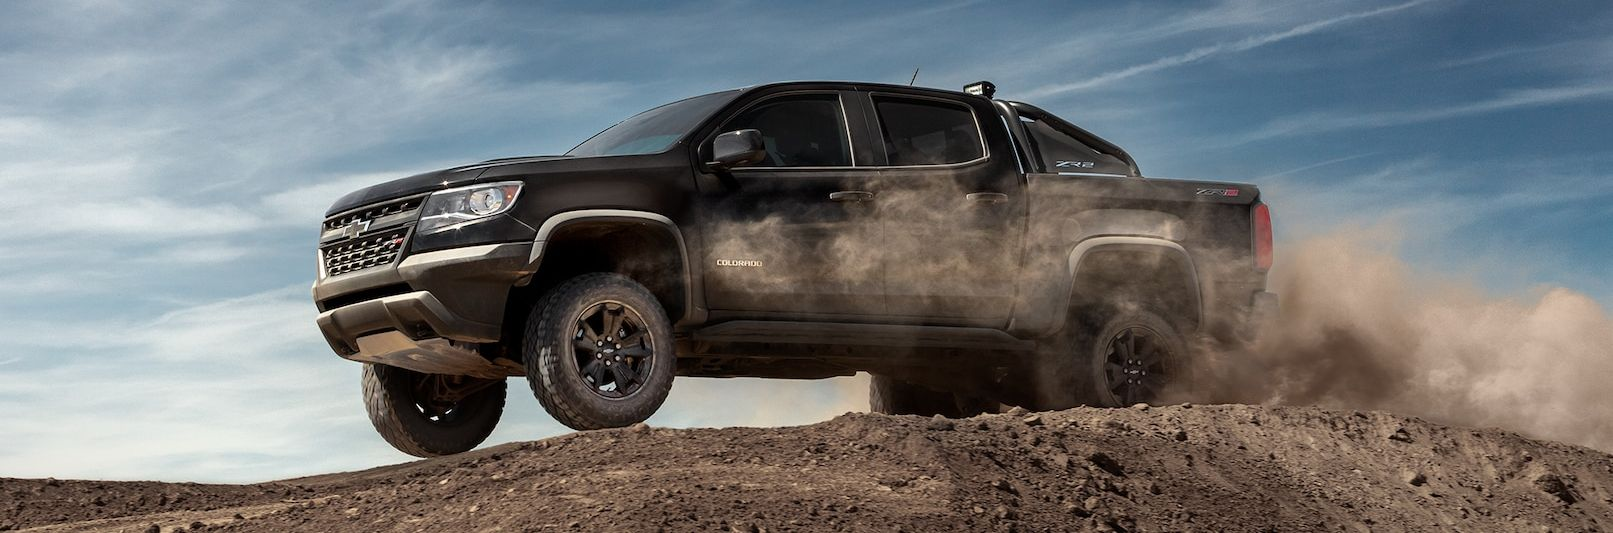 2019 Chevrolet Colorado Leasing near Fairfax, VA